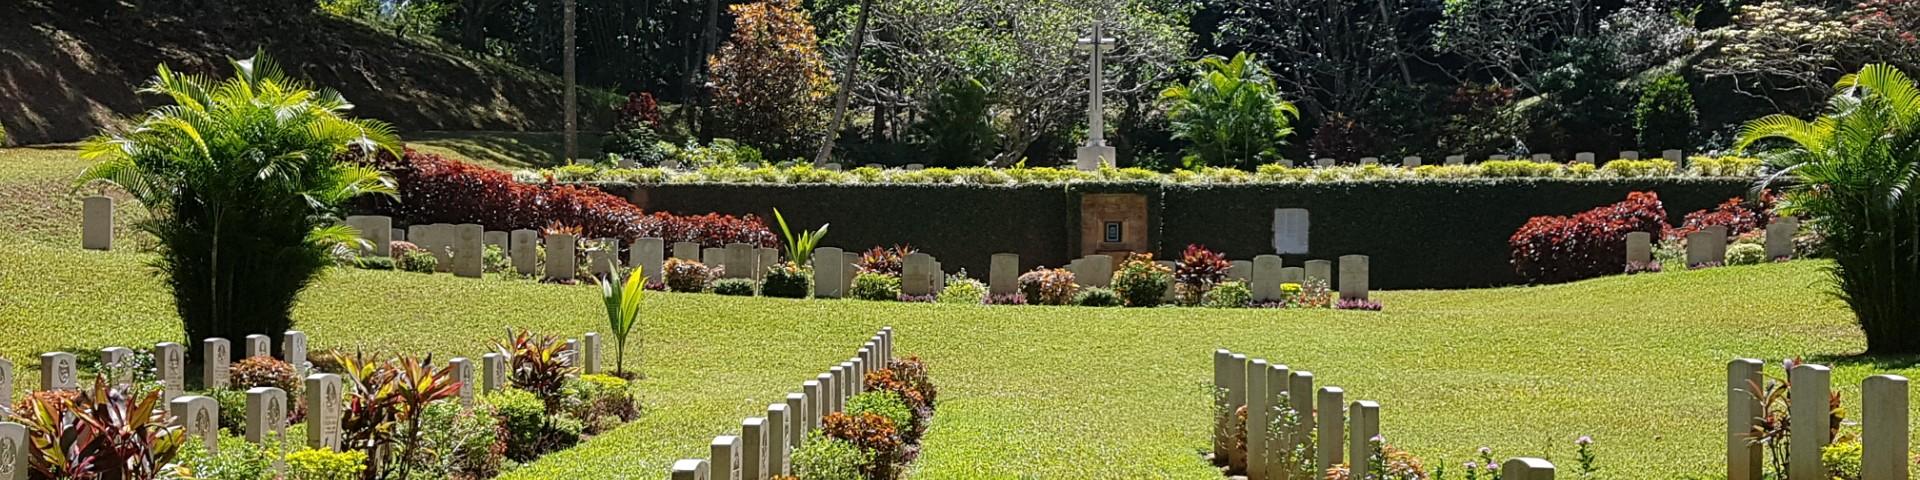 Kandy War Cemetery, Kandy